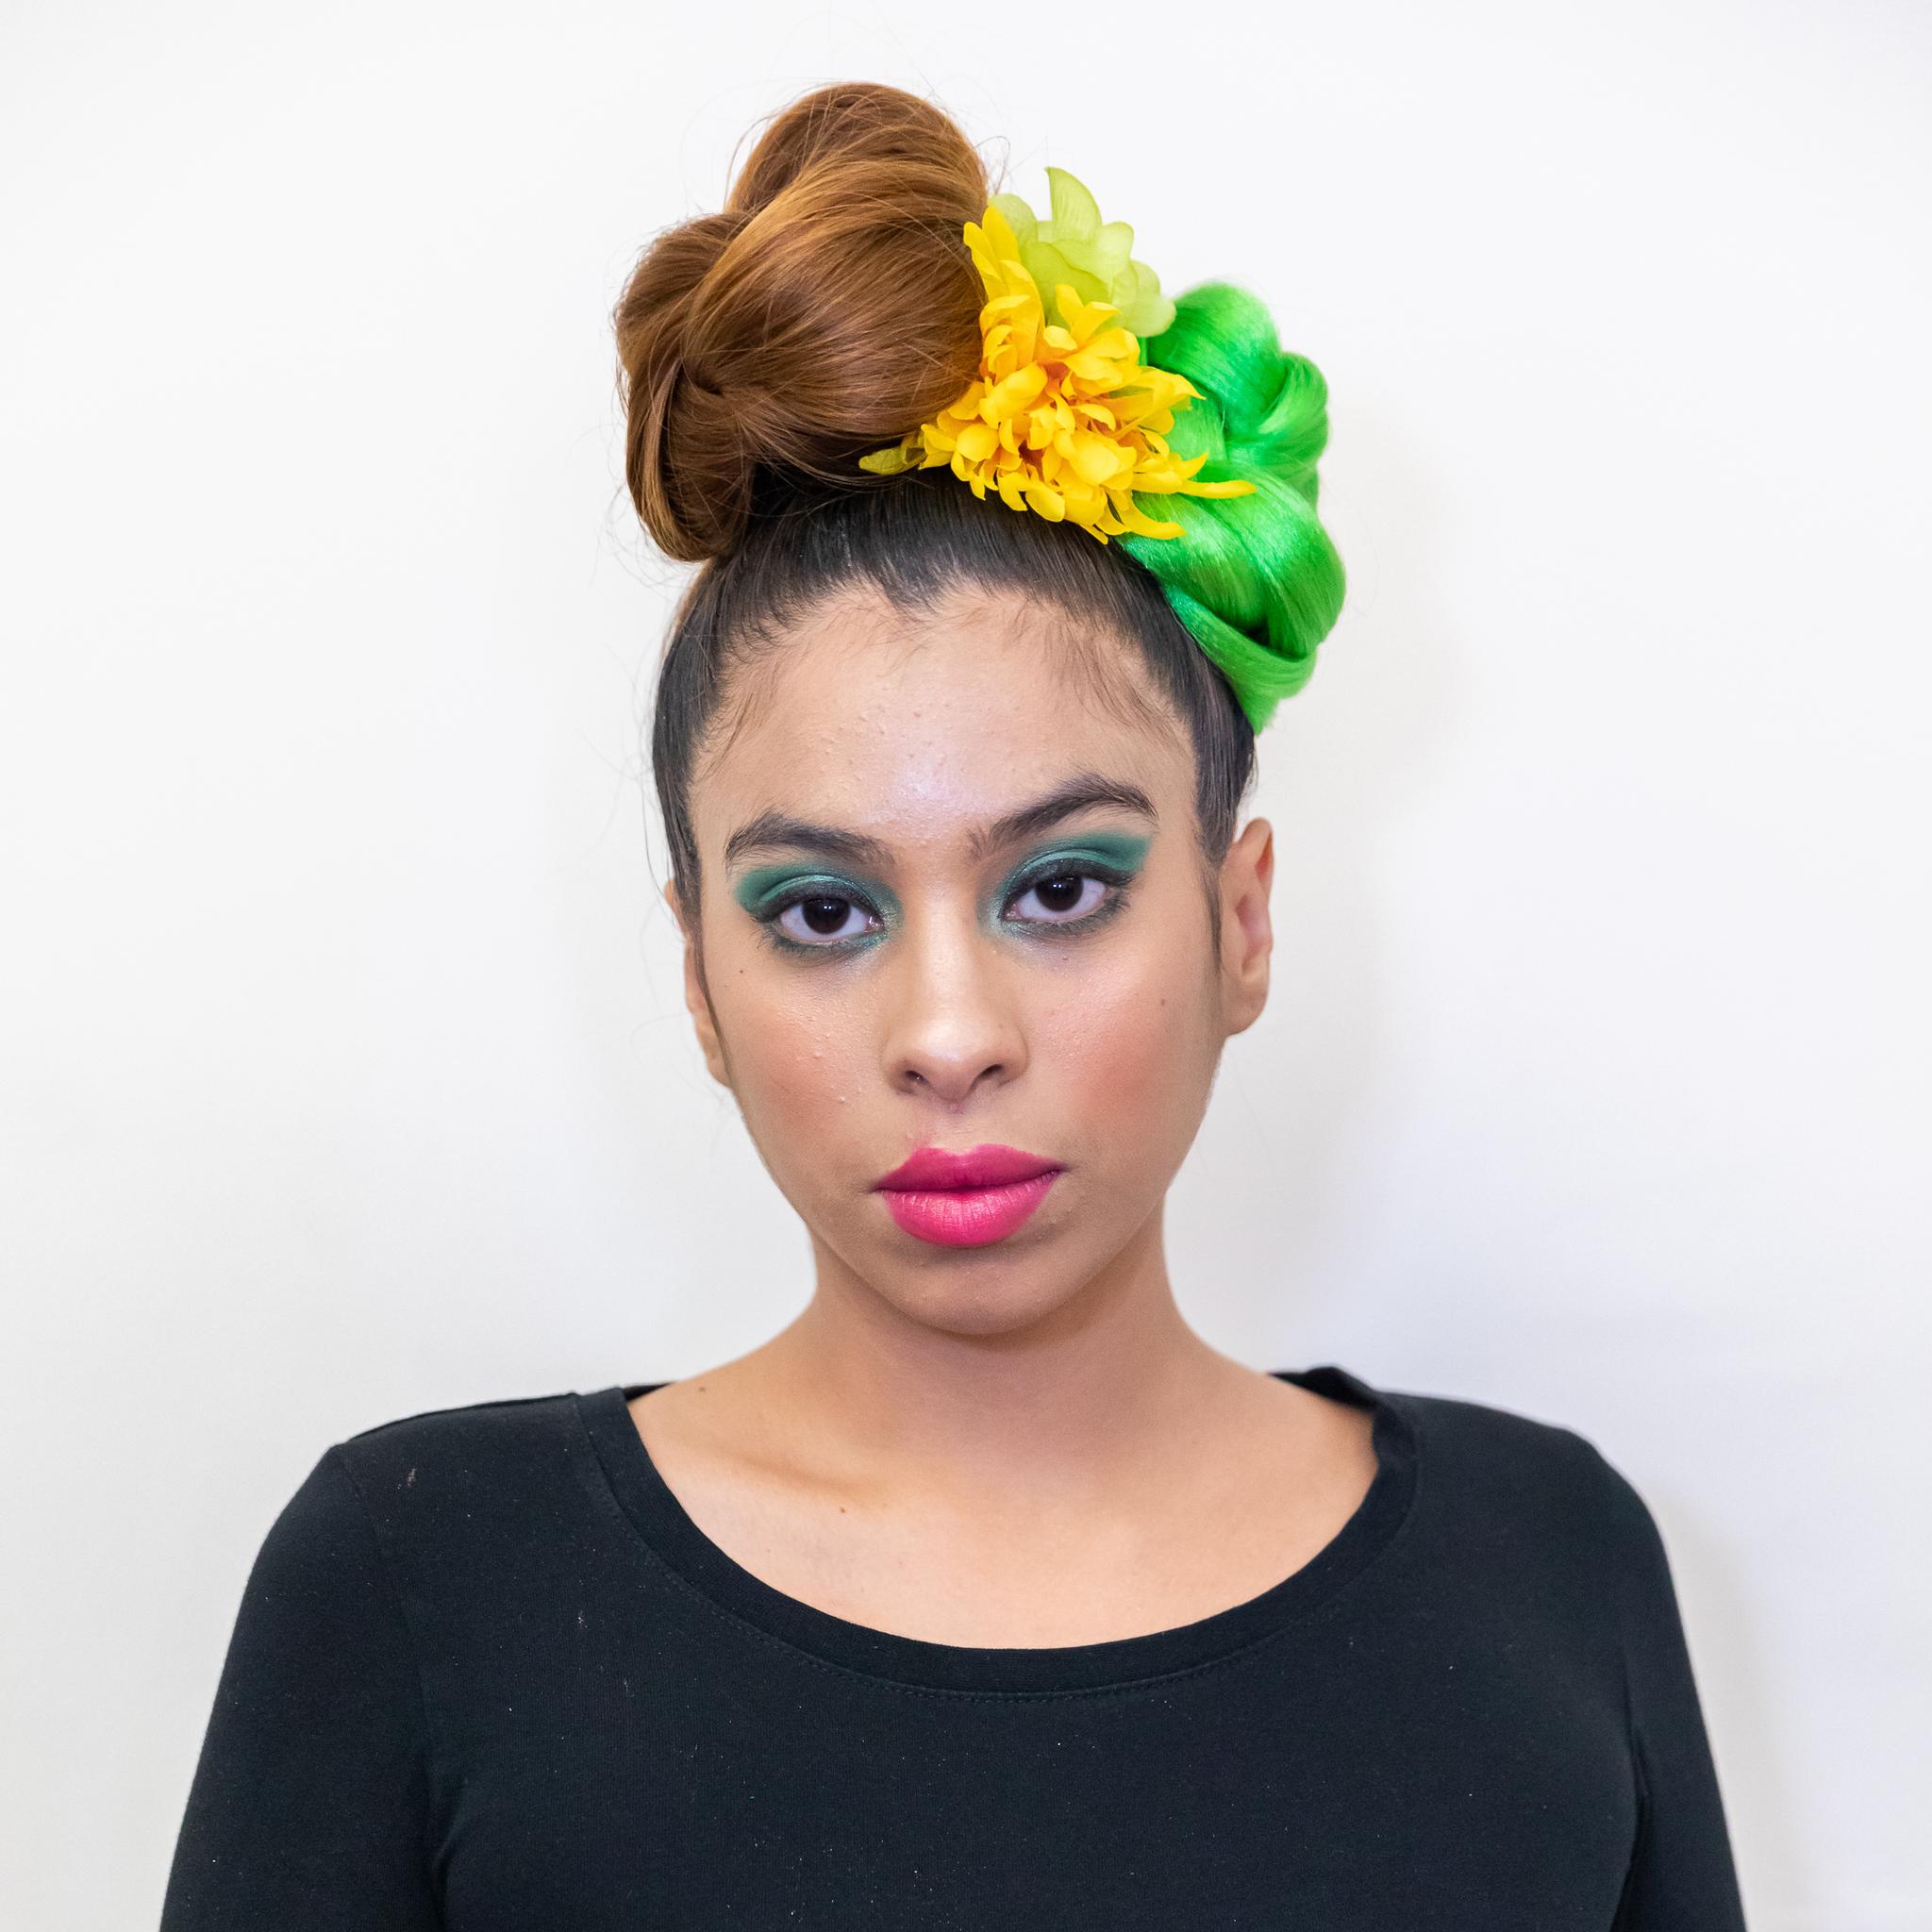 beauty-fashion-week-2019-hair